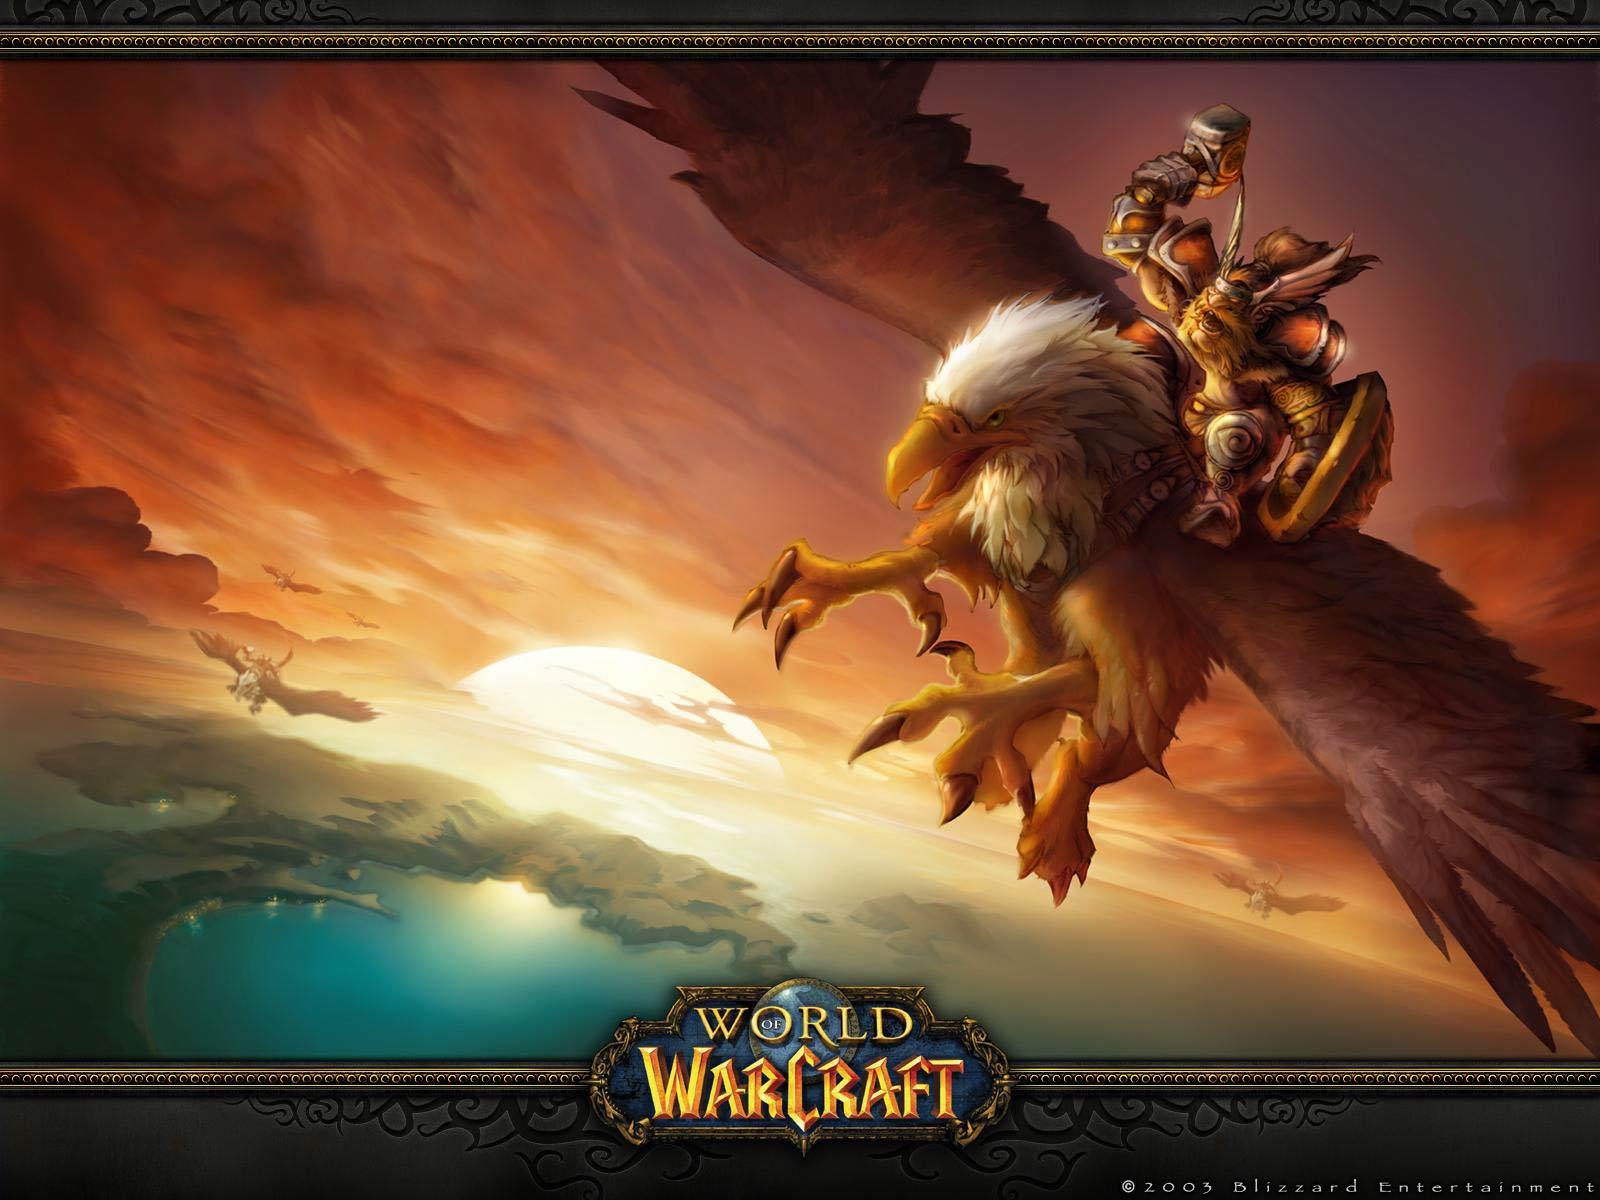 http://1.bp.blogspot.com/-0mRlIpRqjTs/Tkue2Yli7LI/AAAAAAAAAW4/ZpIGA9uUtUs/s1600/World-of-Warcraft+%25282%2529.jpg